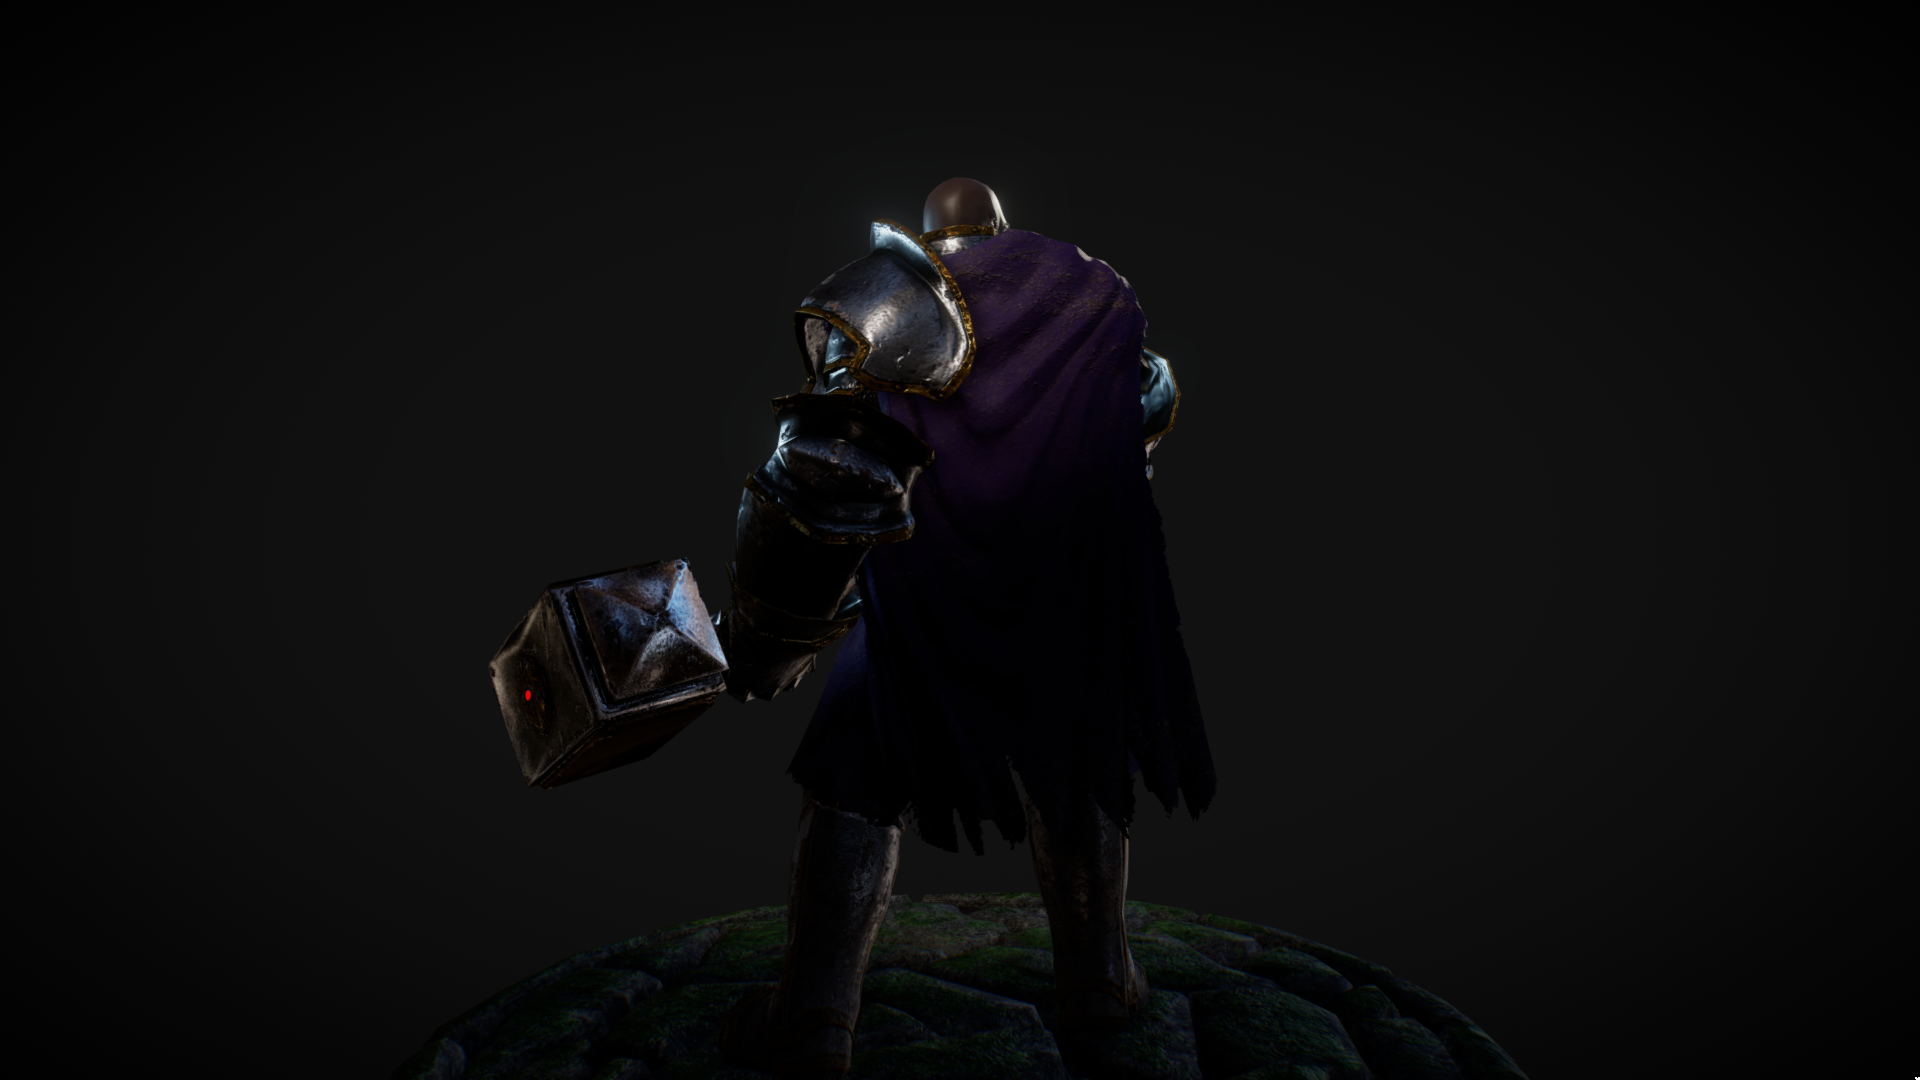 Stylized Paladin Character by MGGeymonat in Characters - UE4 Marketplace